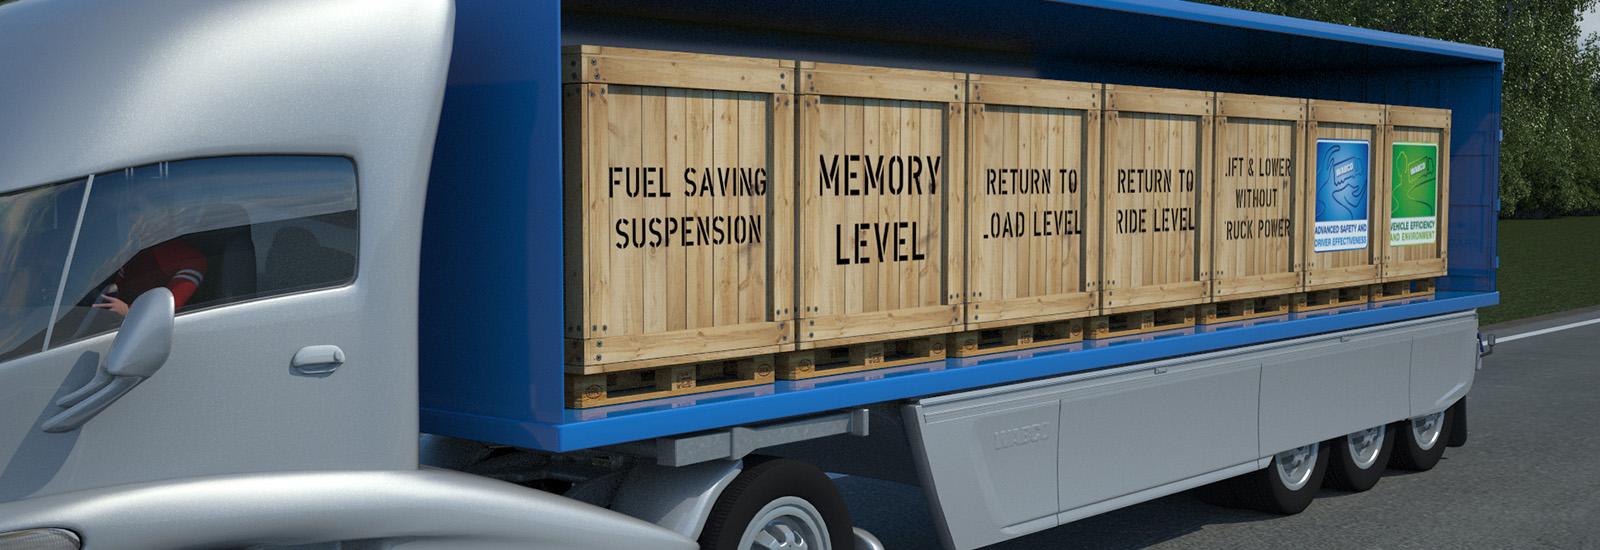 Fuel saving suspension